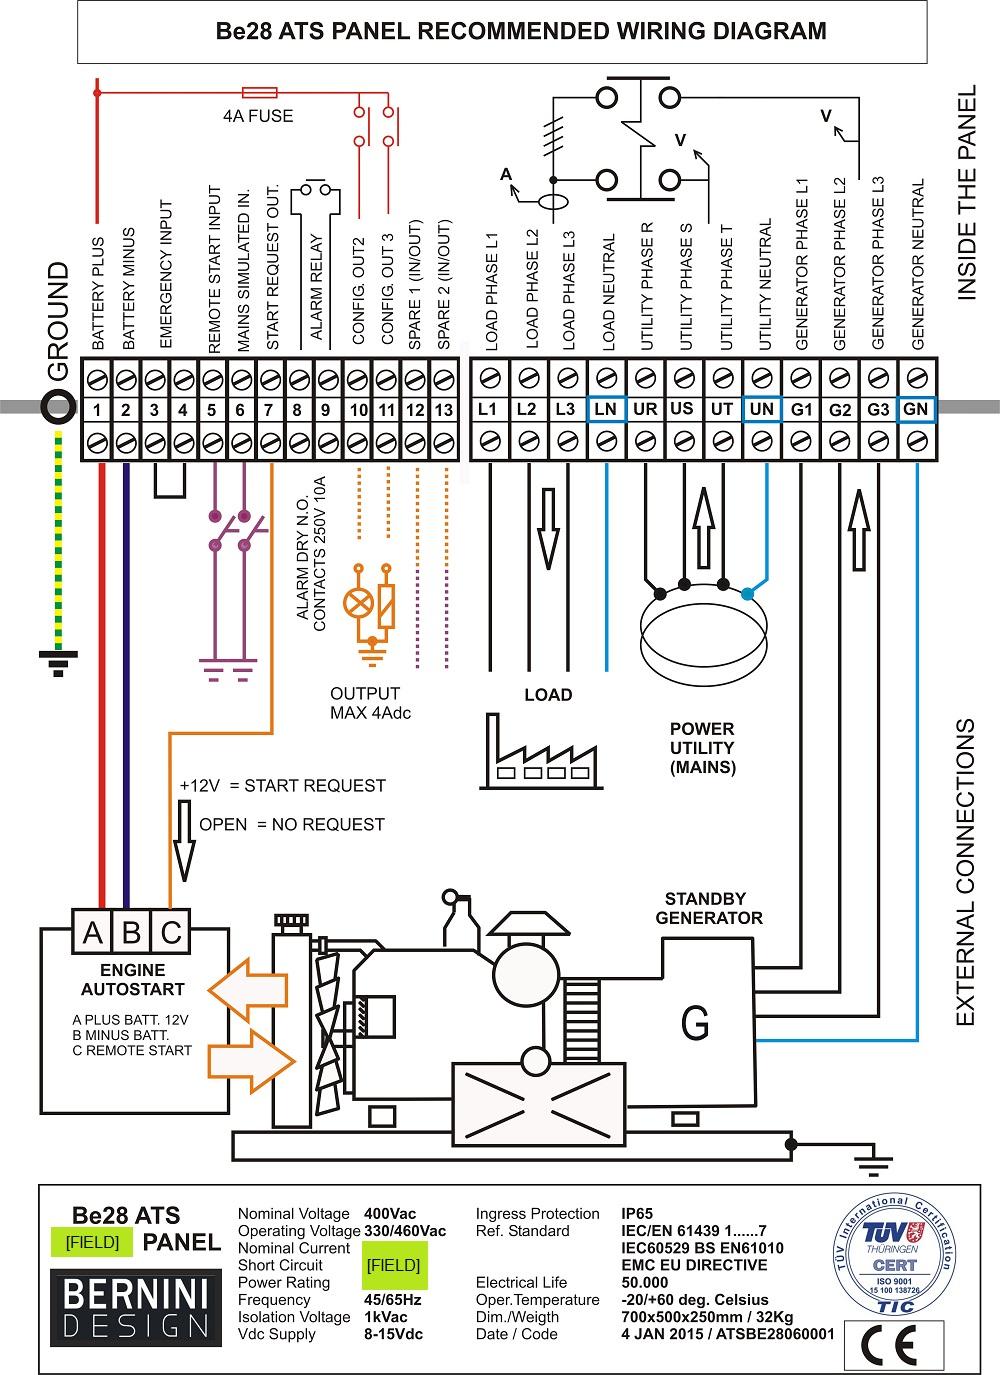 Go Control Panel Wiring Diagram | Wiring Diagram - Generator Backfeed Wiring Diagram